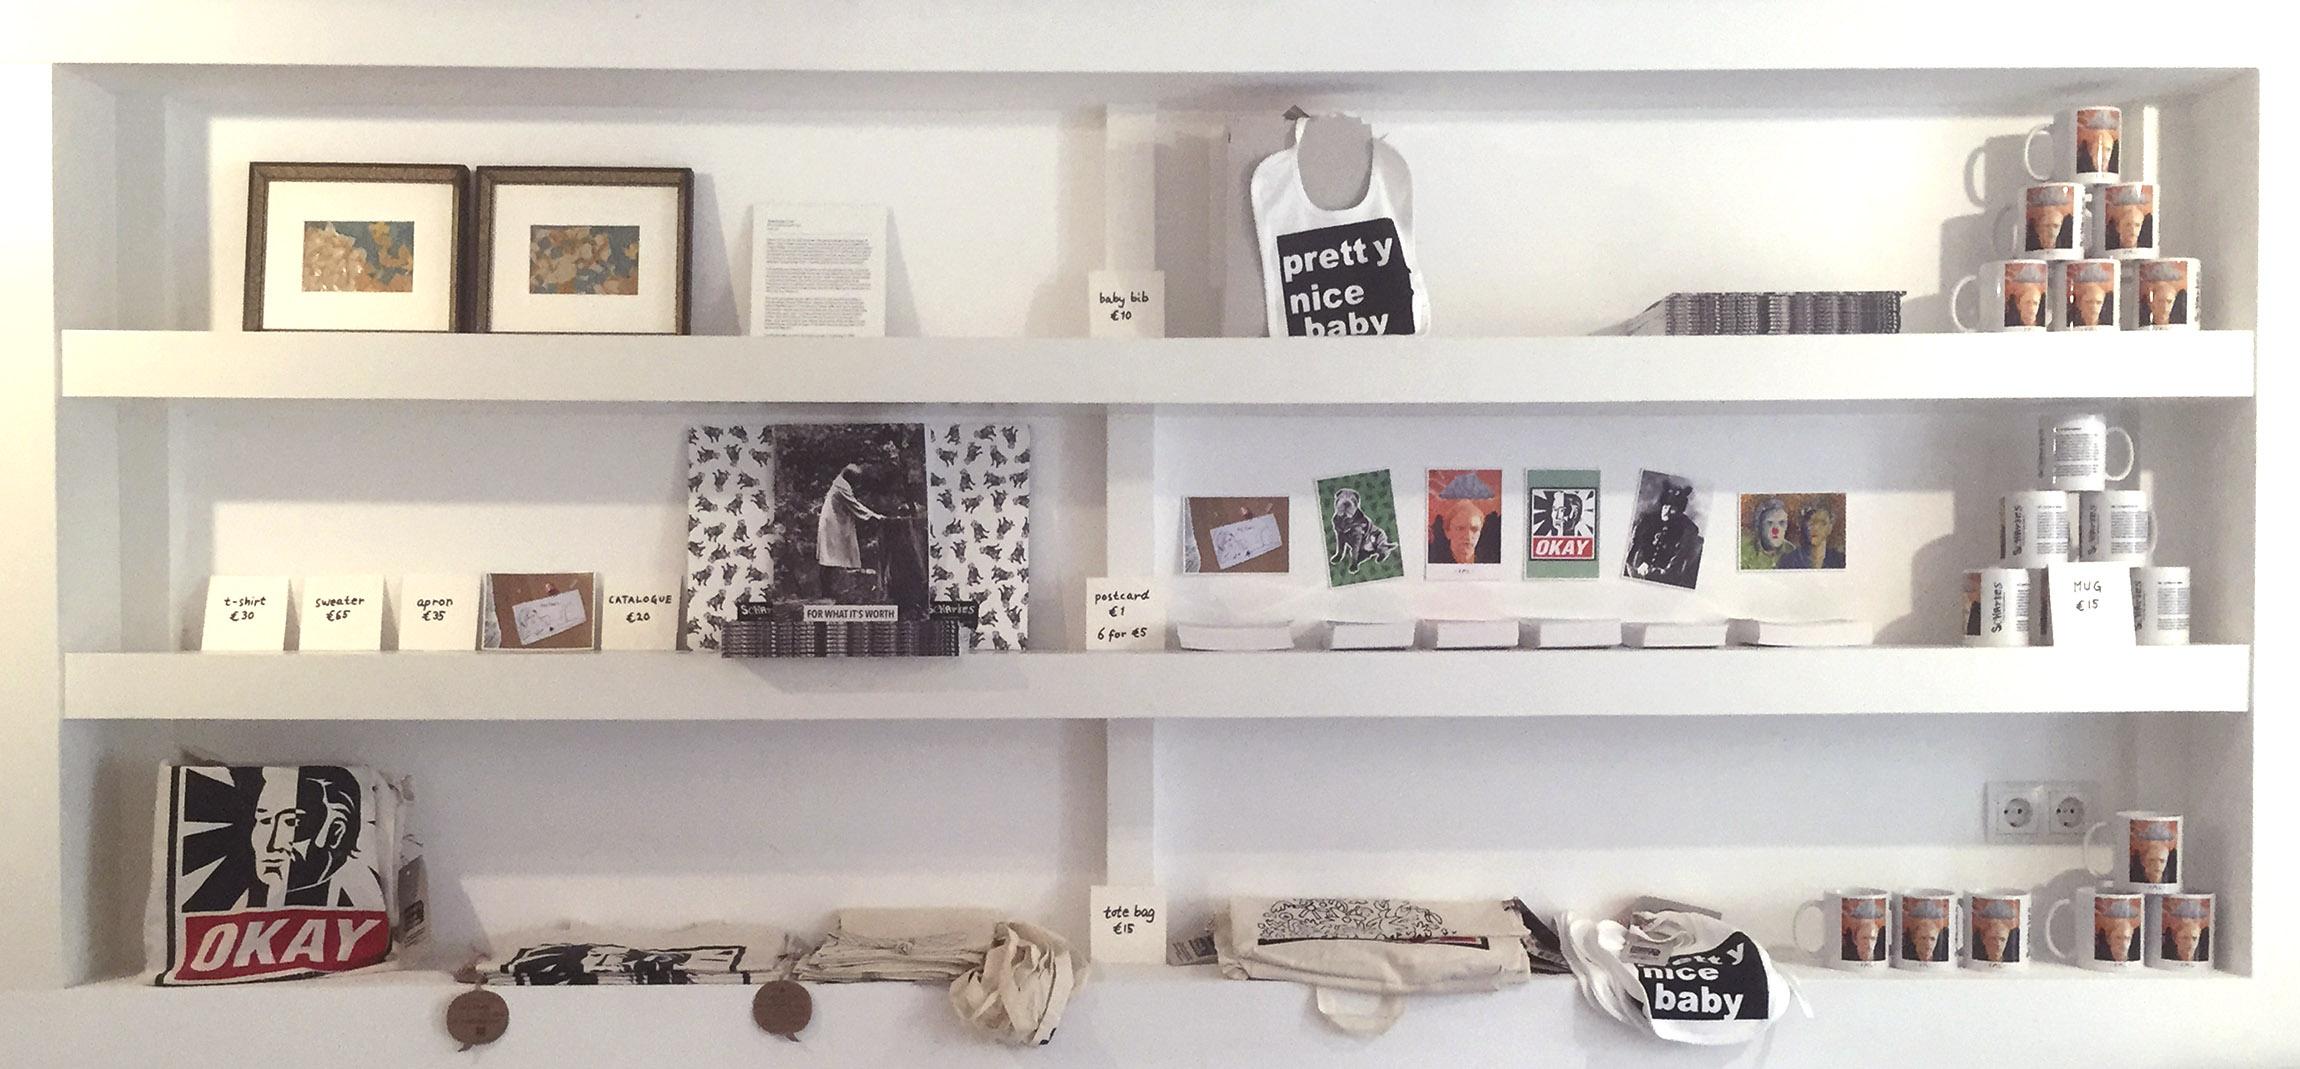 Schatjes-FFIW-tentoonstelling-merchandise_v2